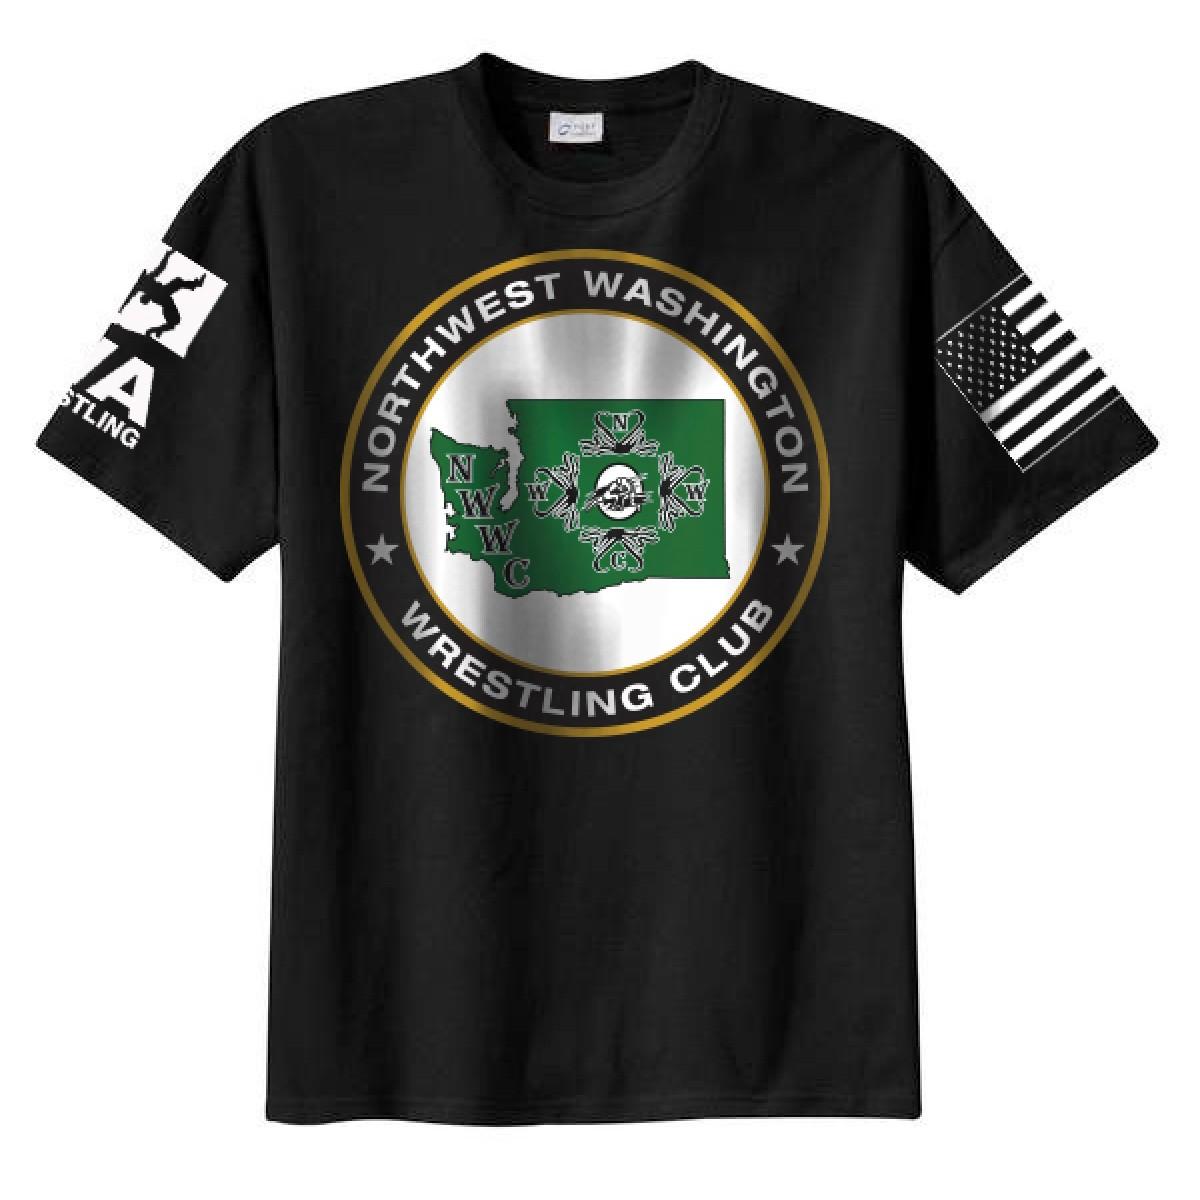 NWWC Black T-Shirt With Green Logo-Black-3XL